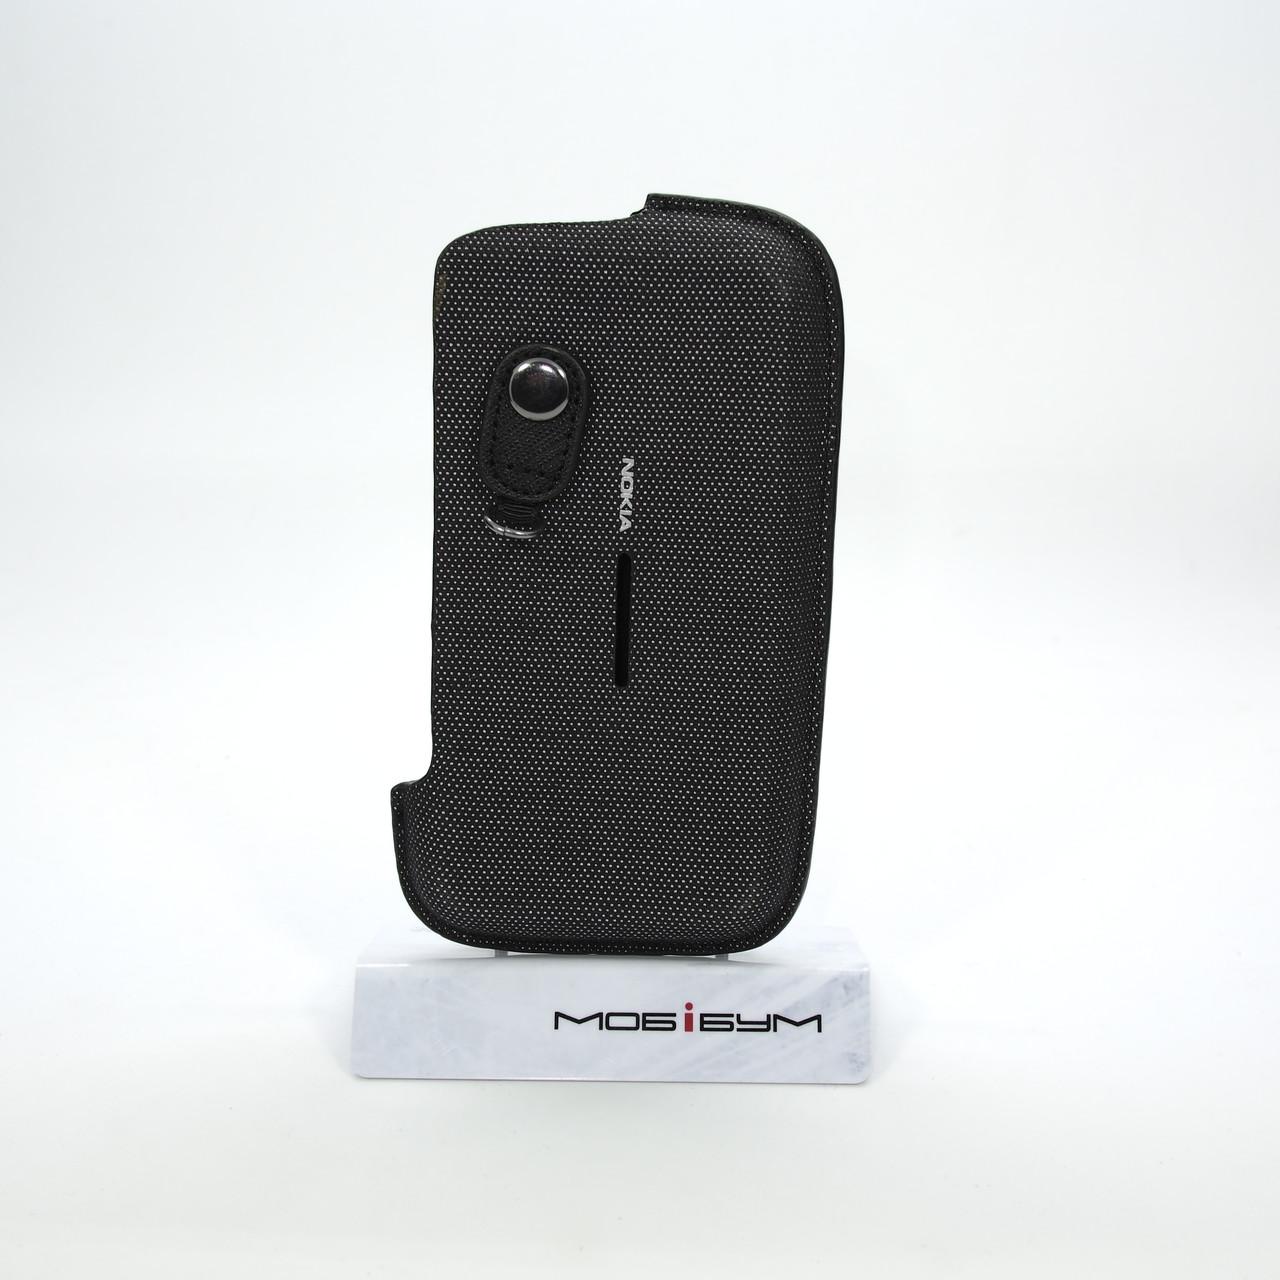 Чехол Nokia CP-506 C7 Protective Pouch black